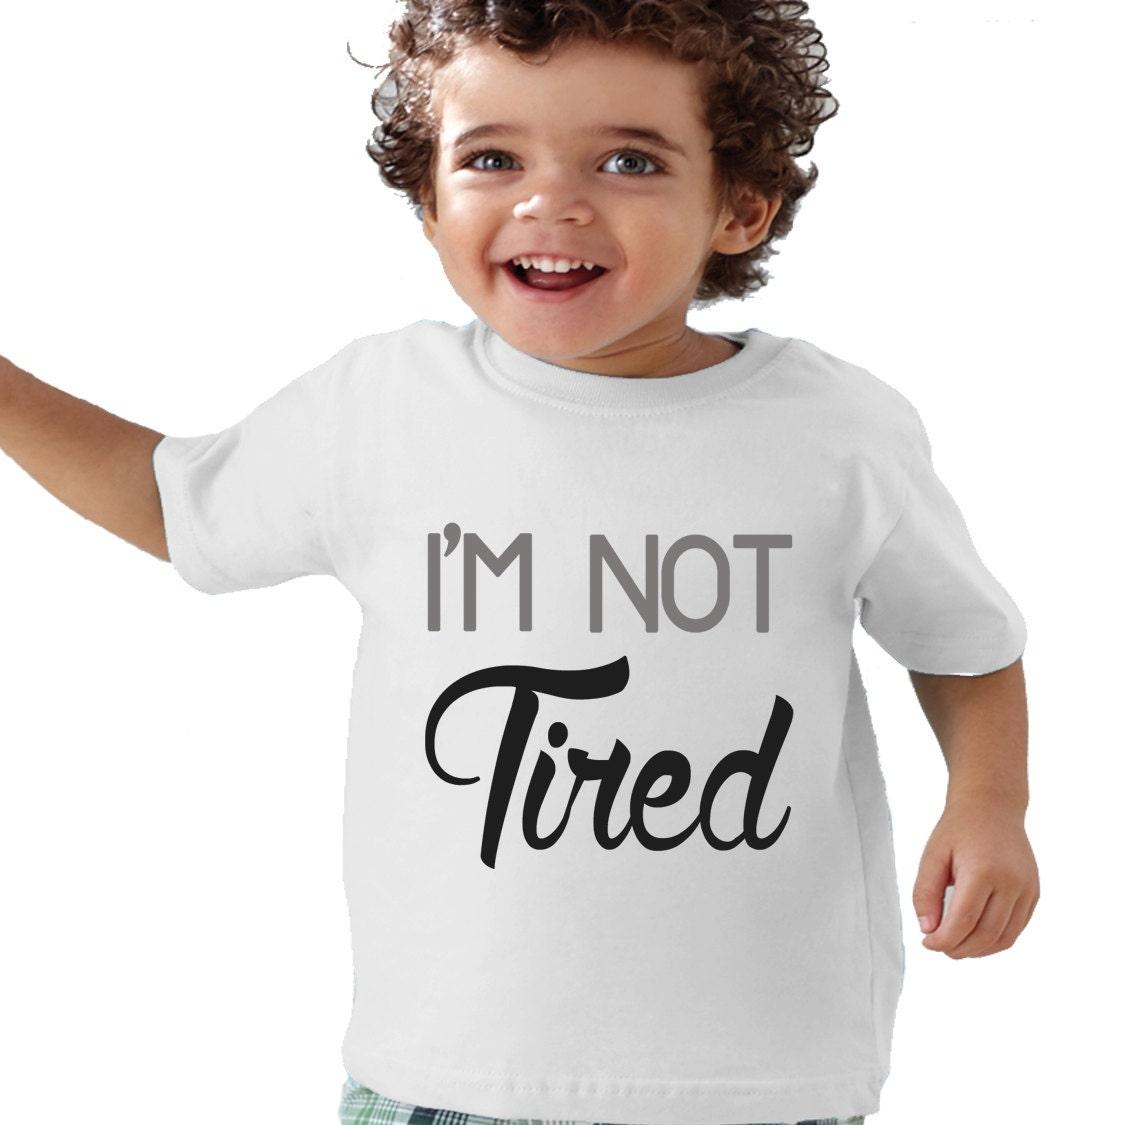 I'm NOT Tired Children Shirt